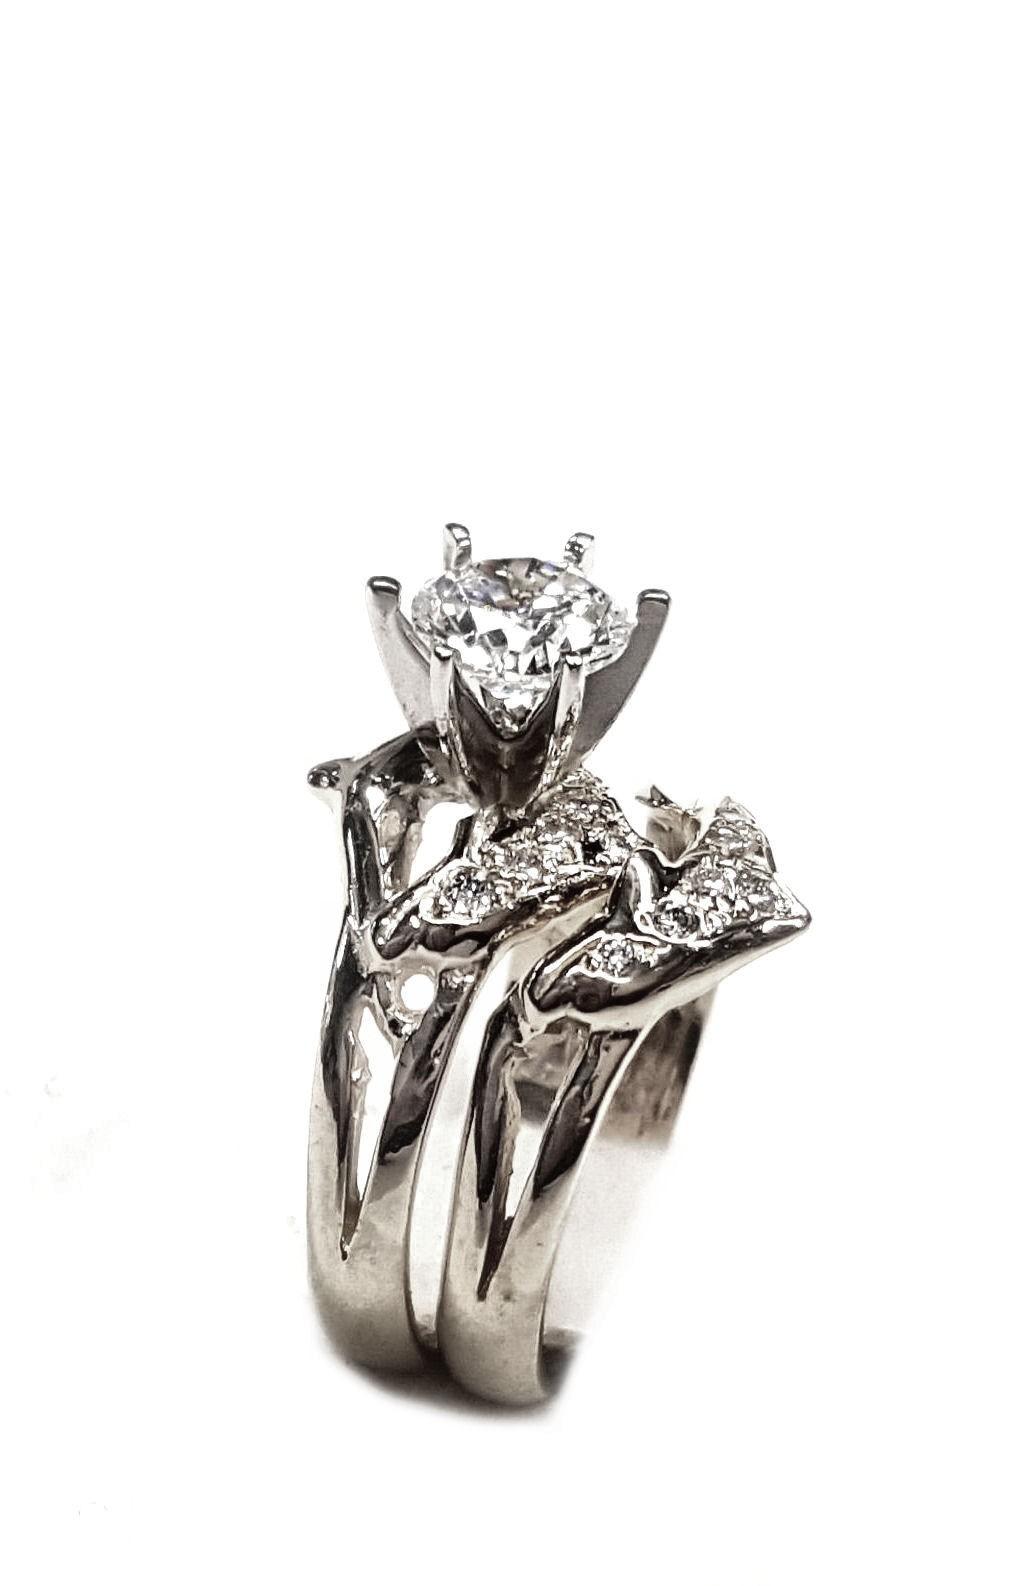 double diamond dolphin wedding set 1 4ct center diamond dolphin wedding rings Double diamond dolphin wedding set 1 4ct center diamond